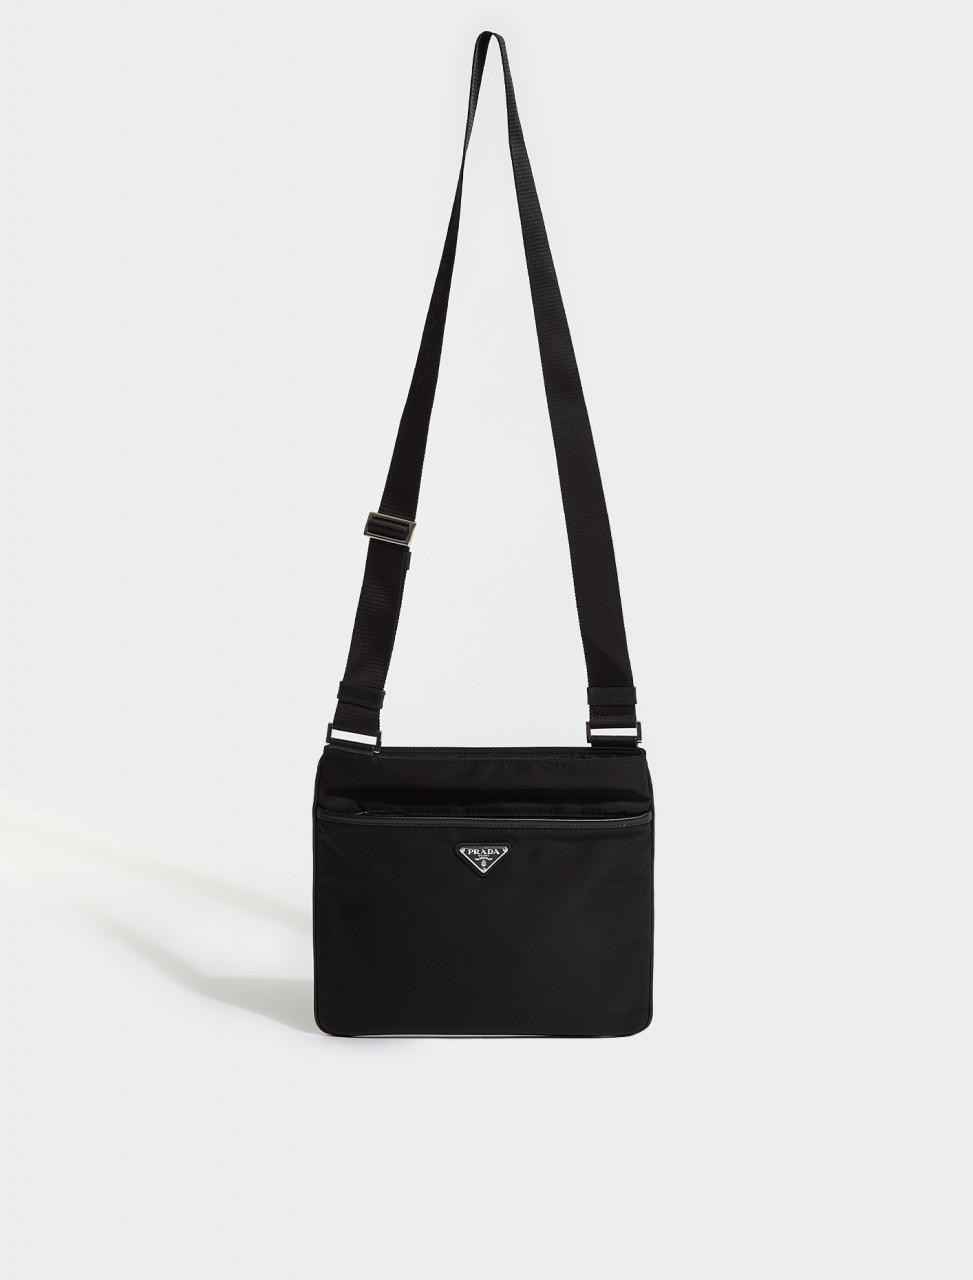 2VH053-F0002 PRADA RE-NYLON AND SAFFIANO LEATHER BAG WITH STRAP IN BLACK